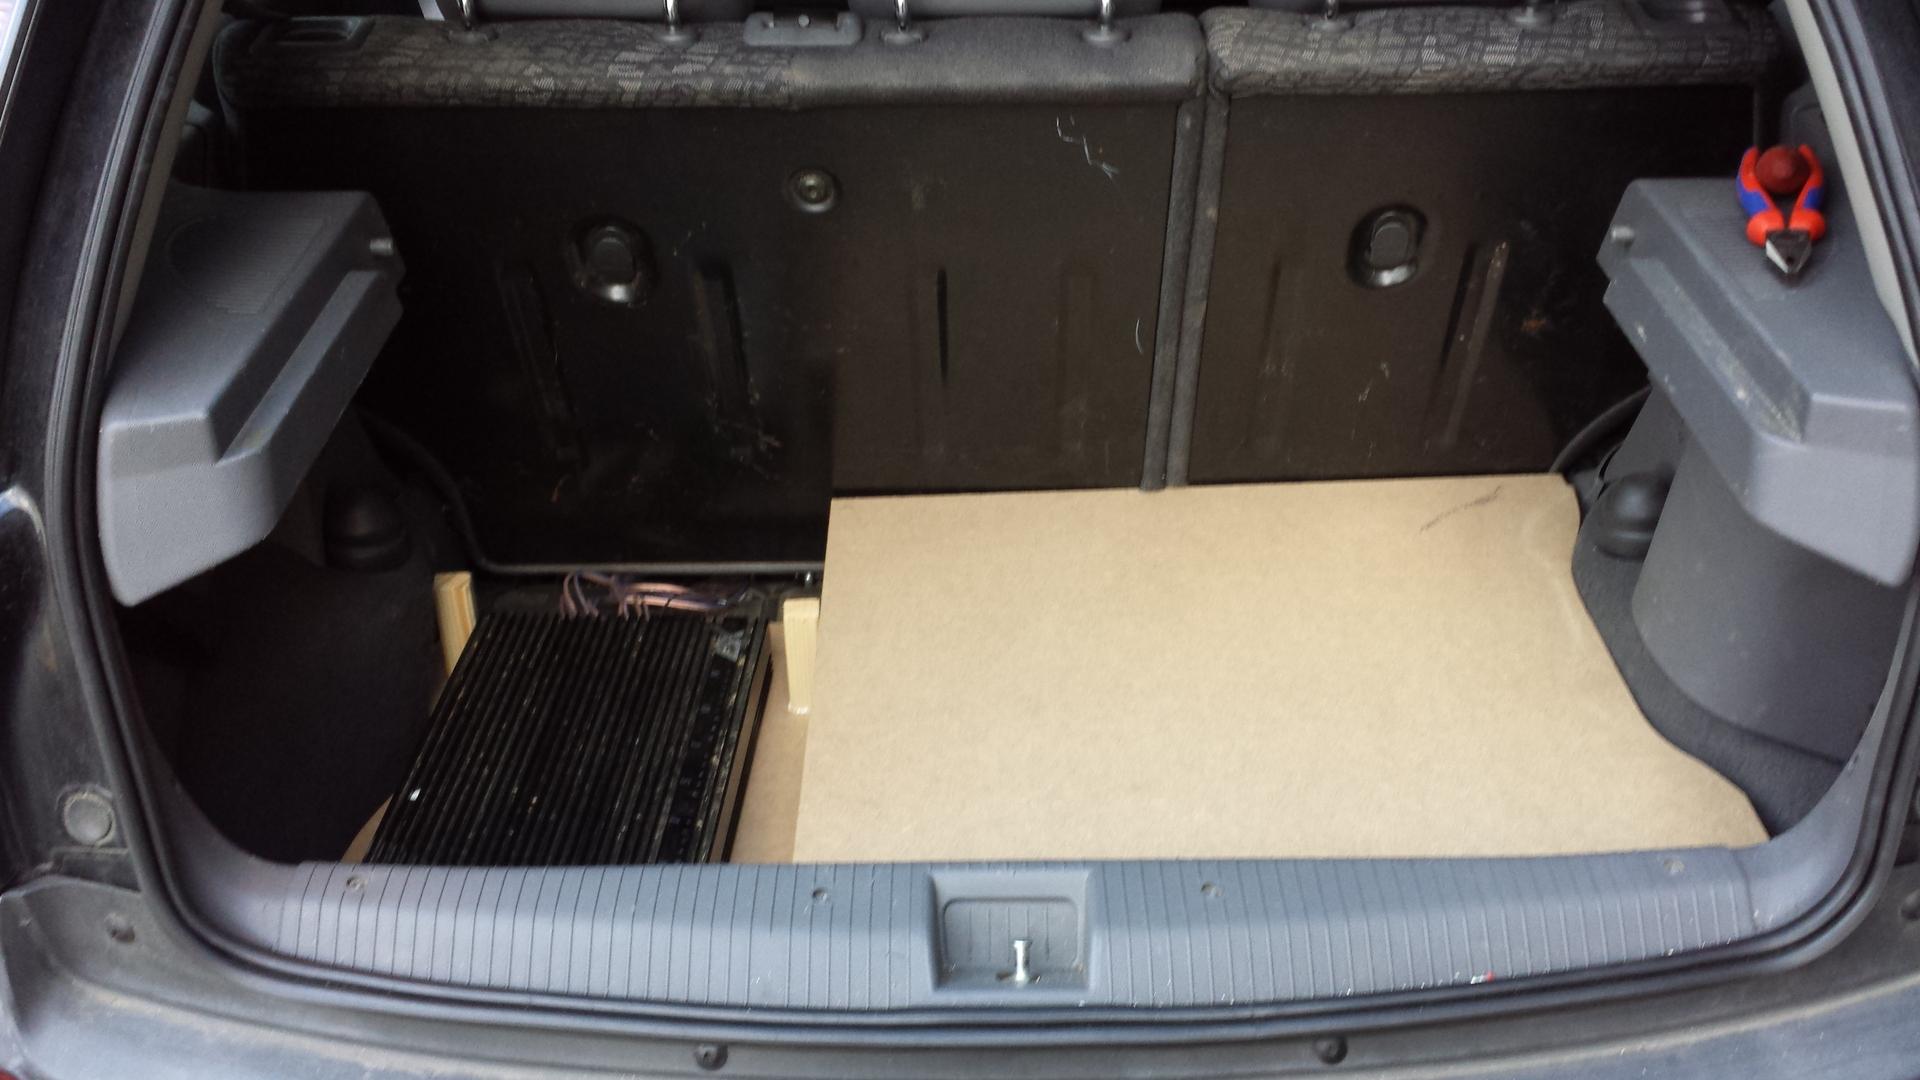 kofferraum ausbau ausbau kofferraum hifi. Black Bedroom Furniture Sets. Home Design Ideas